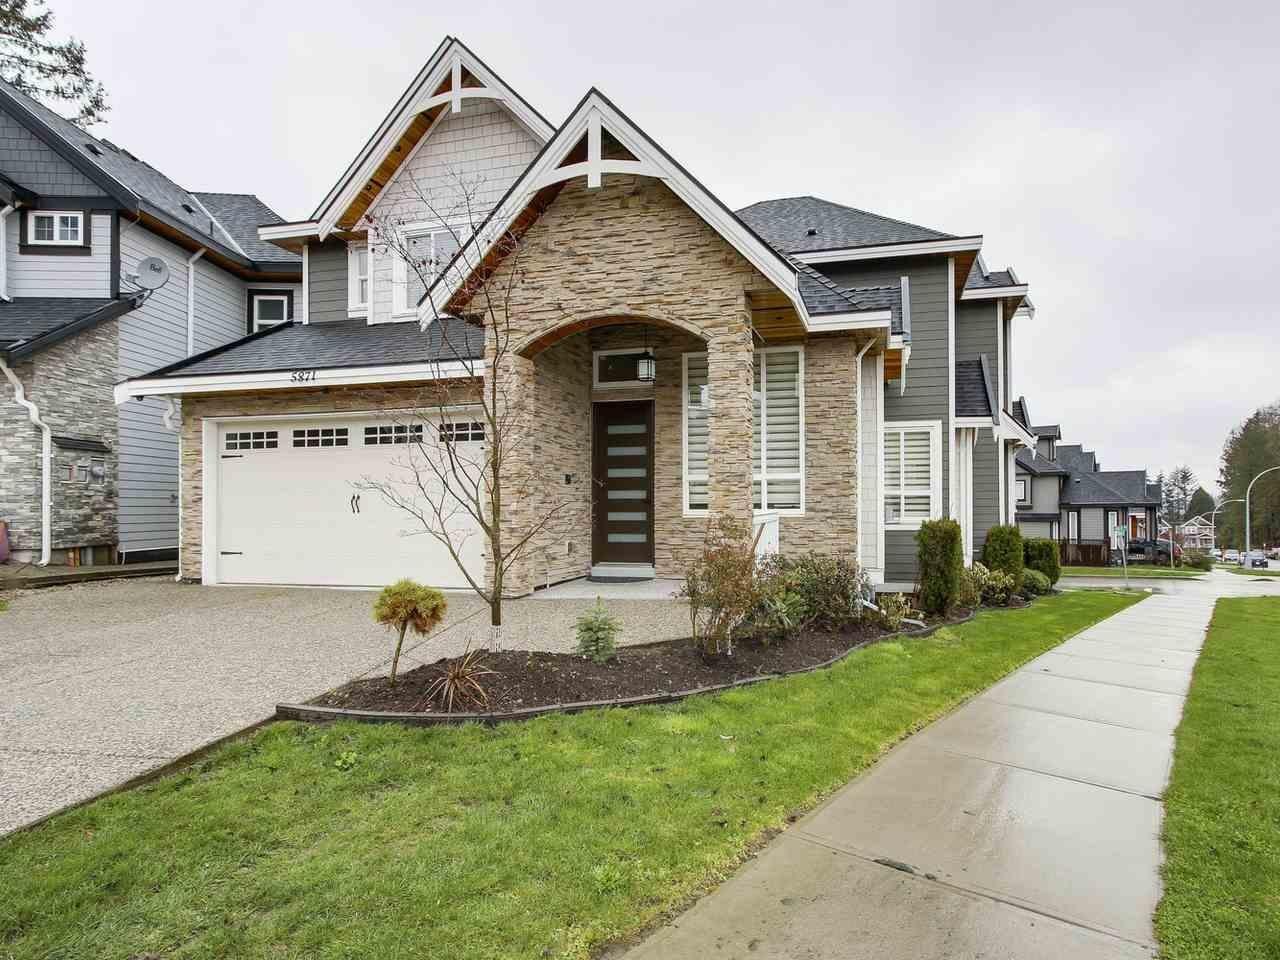 R2153133 - 5871 139A STREET, Sullivan Station, Surrey, BC - House/Single Family